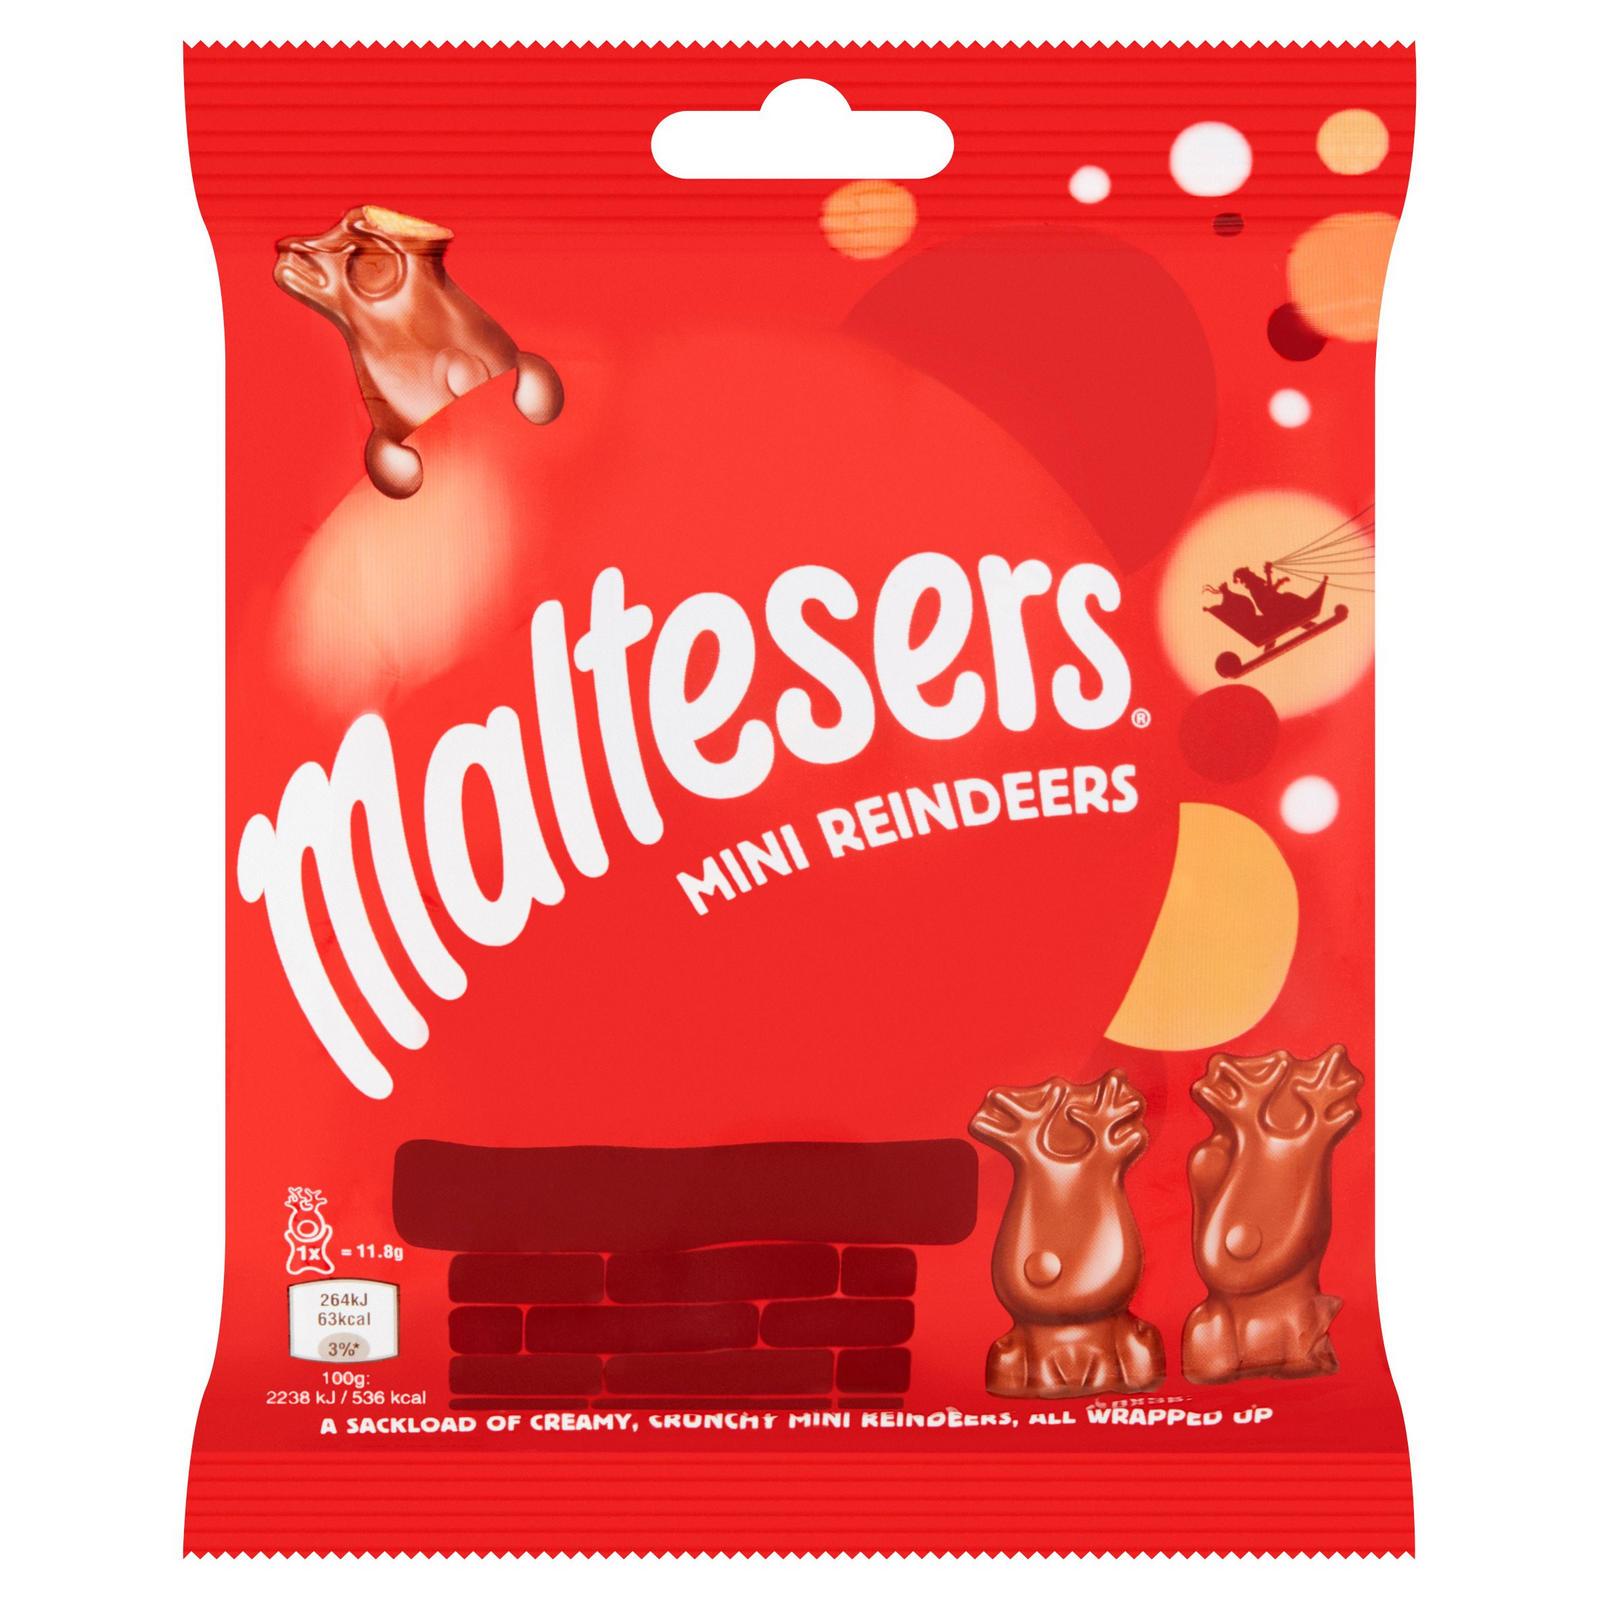 Malteser mini reindeer - 10p @ Sainsbury's petrol station Sheffield